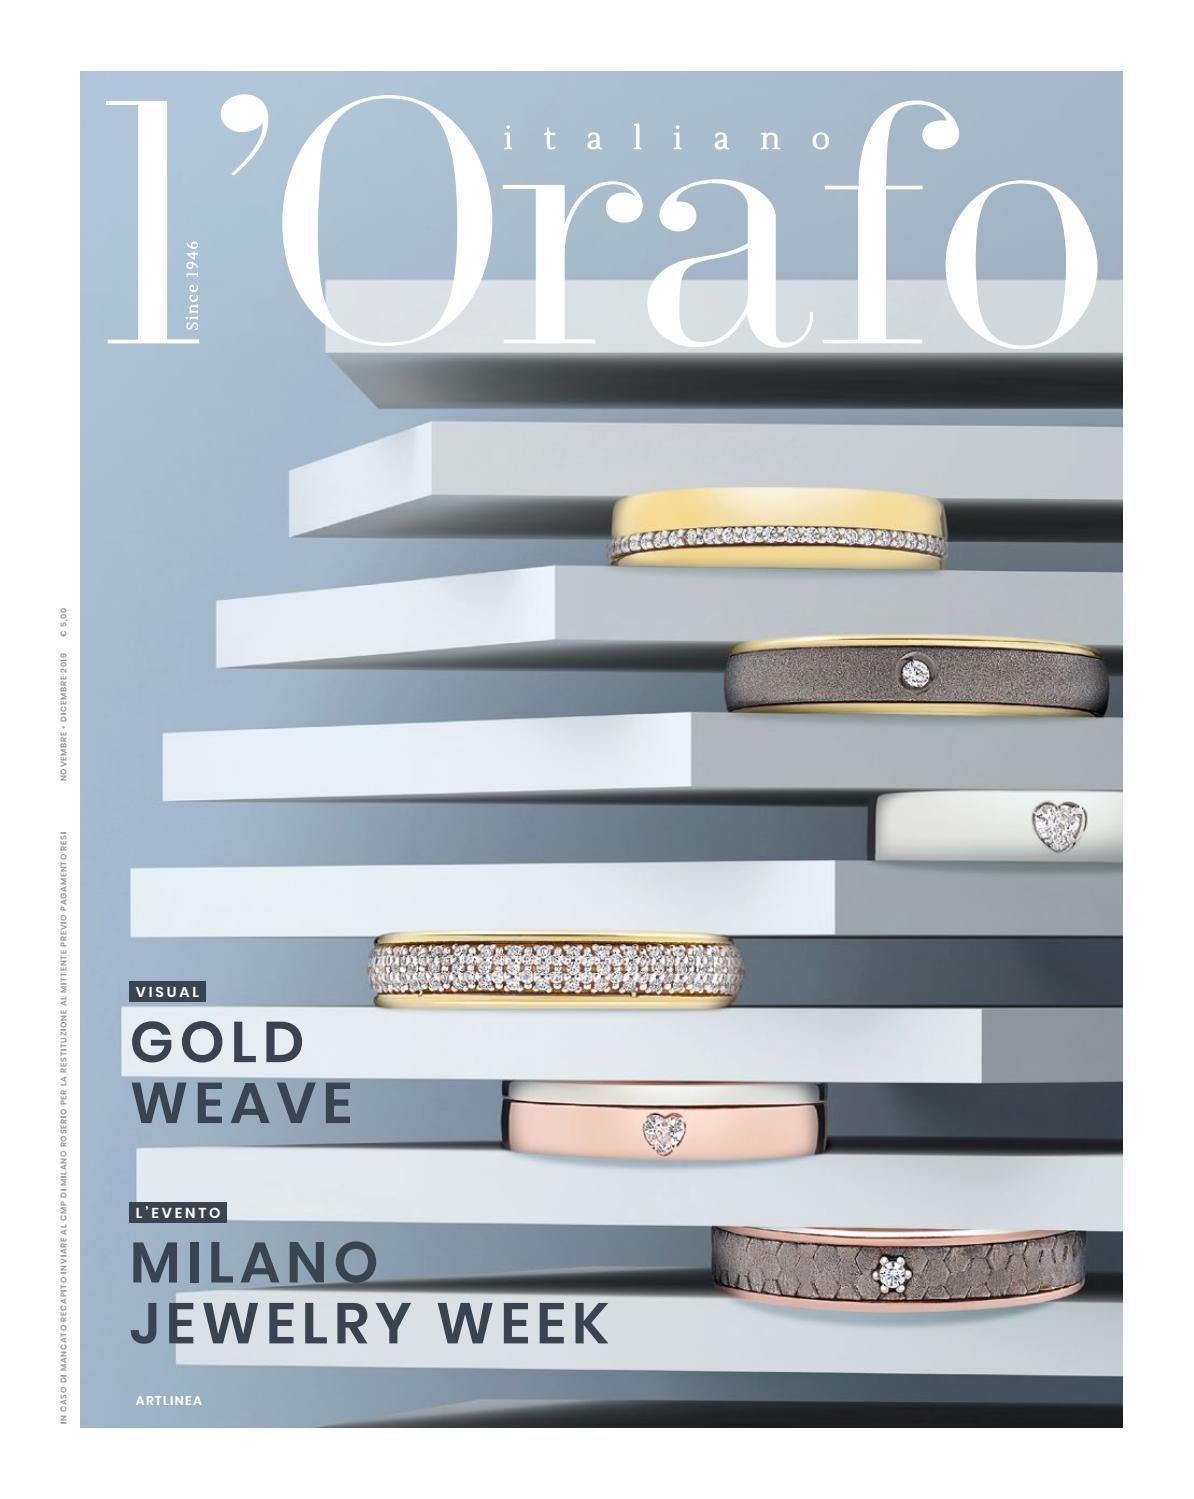 l'Orafo Italiano 11 12 2019 by Edifis issuu